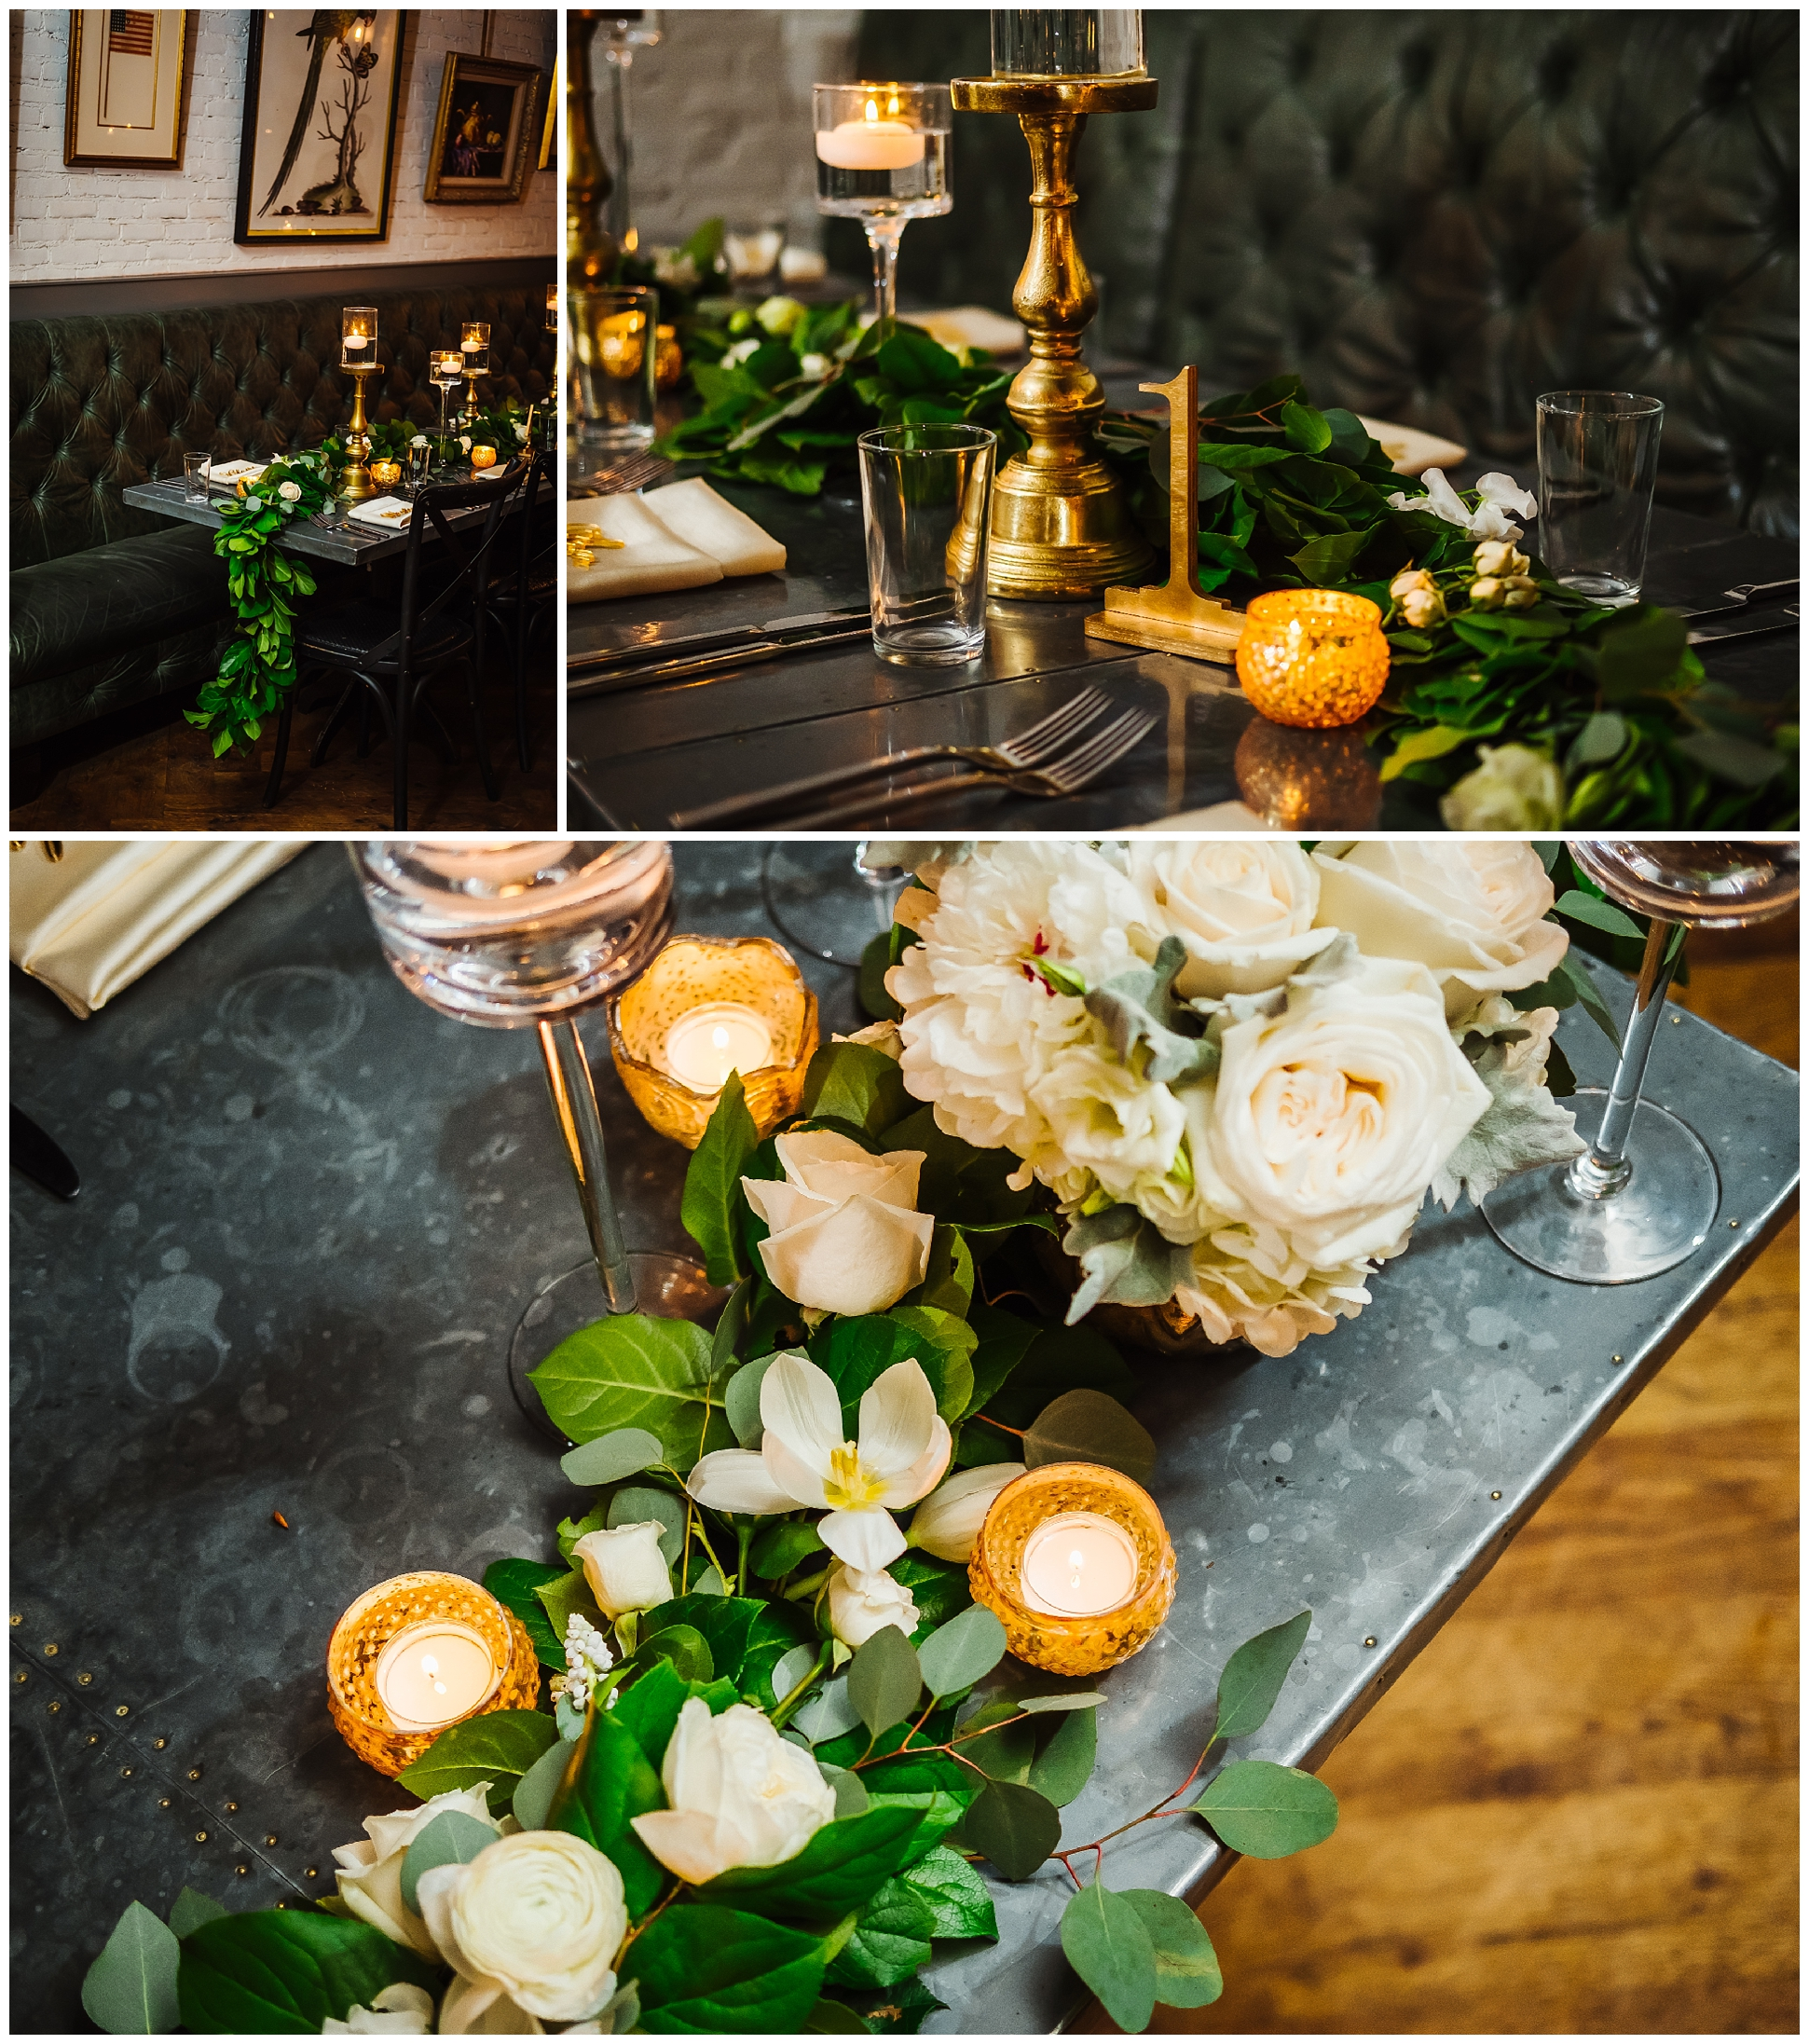 tampa-wedding-photographer-oxford-exchange-garland-candlelight-gold-hayley-paige_0052.jpg